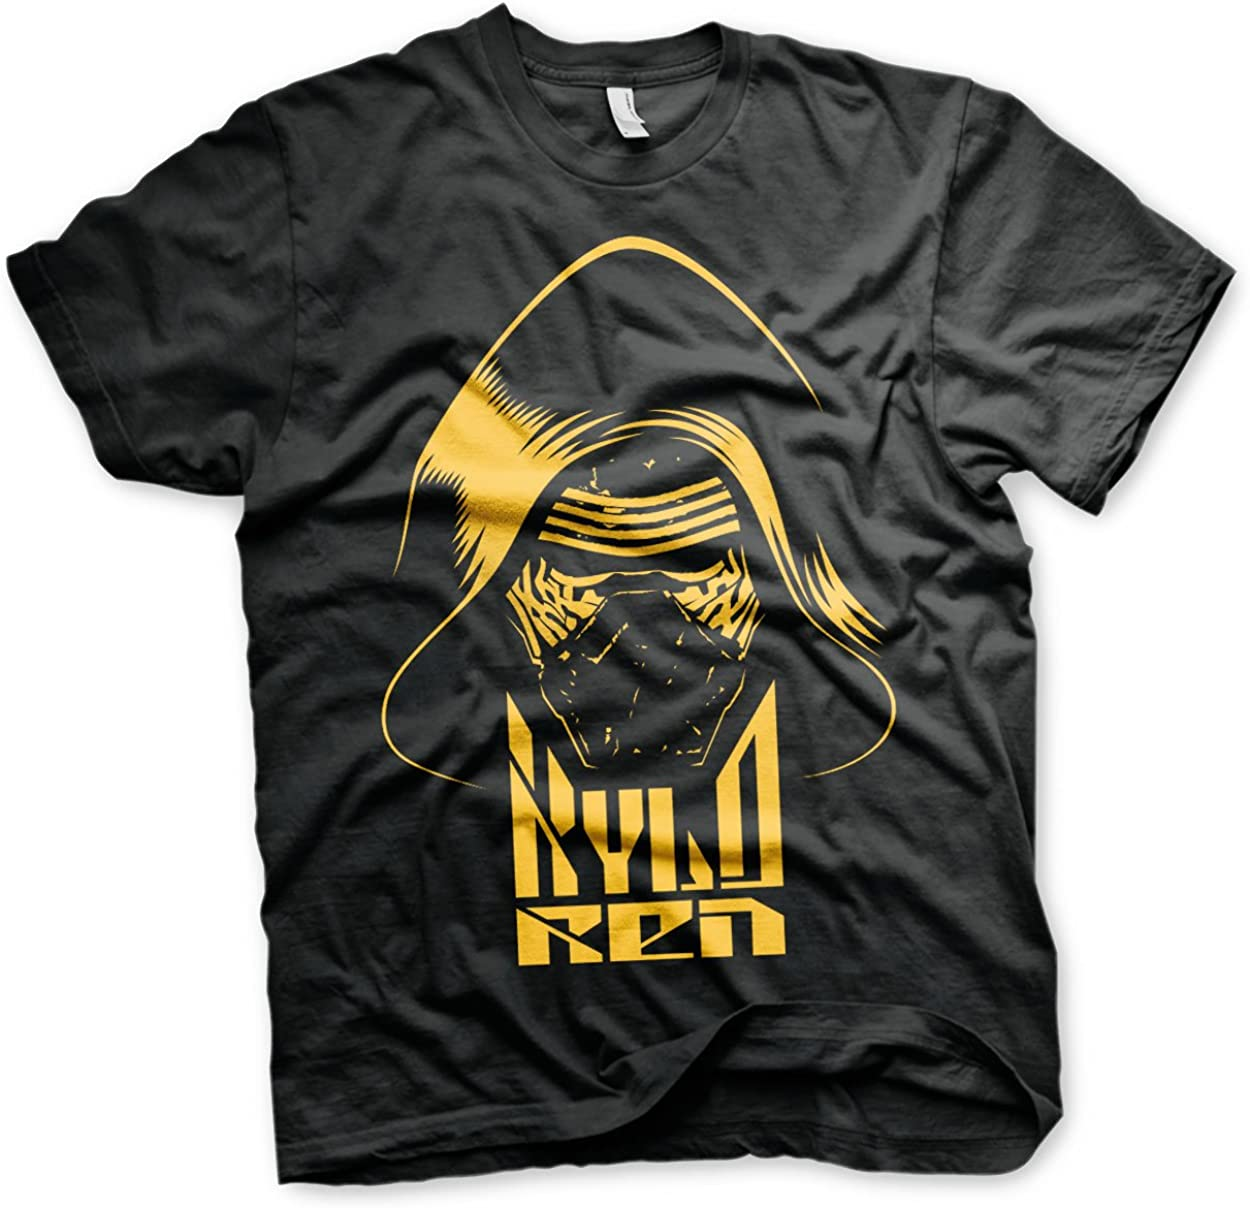 4XL Officially Licensed Star Wars 5XL Men/'s T-Shirt Kylo Ren BIG /& TALL 3XL